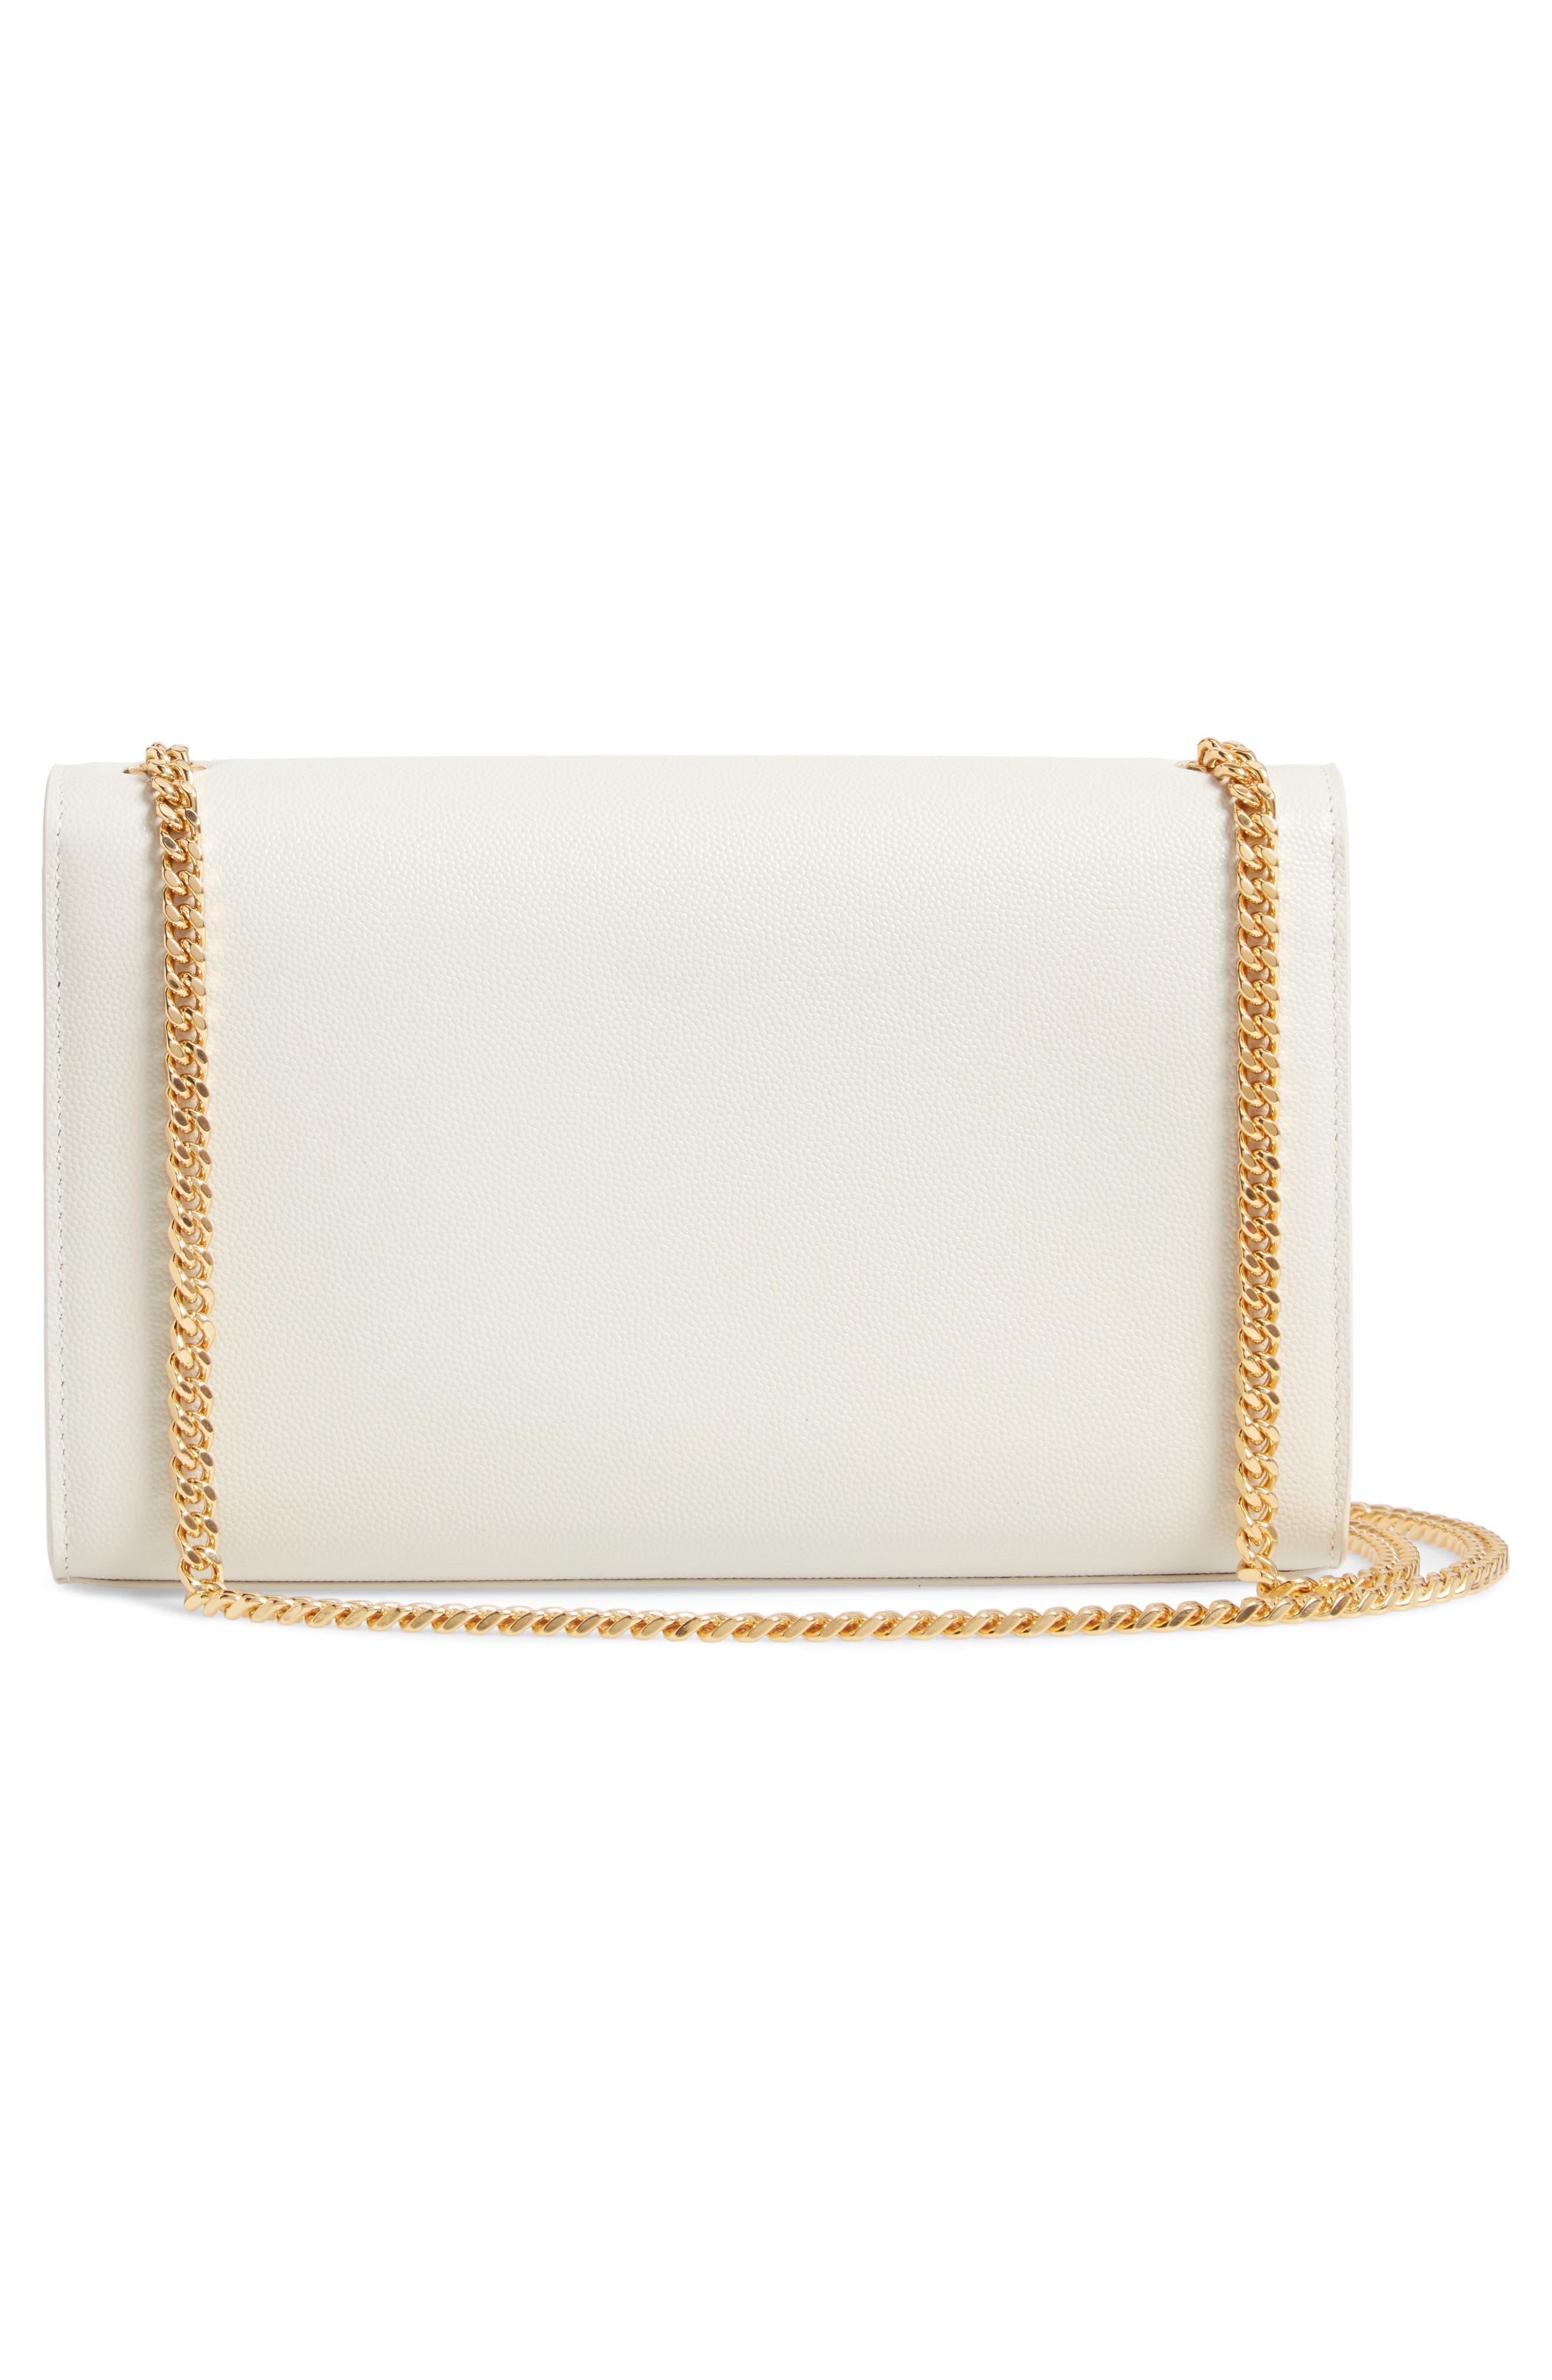 ,                             'Medium Kate' Leather Chain Shoulder Bag,                             Alternate thumbnail 3, color,                             CREMASOFT